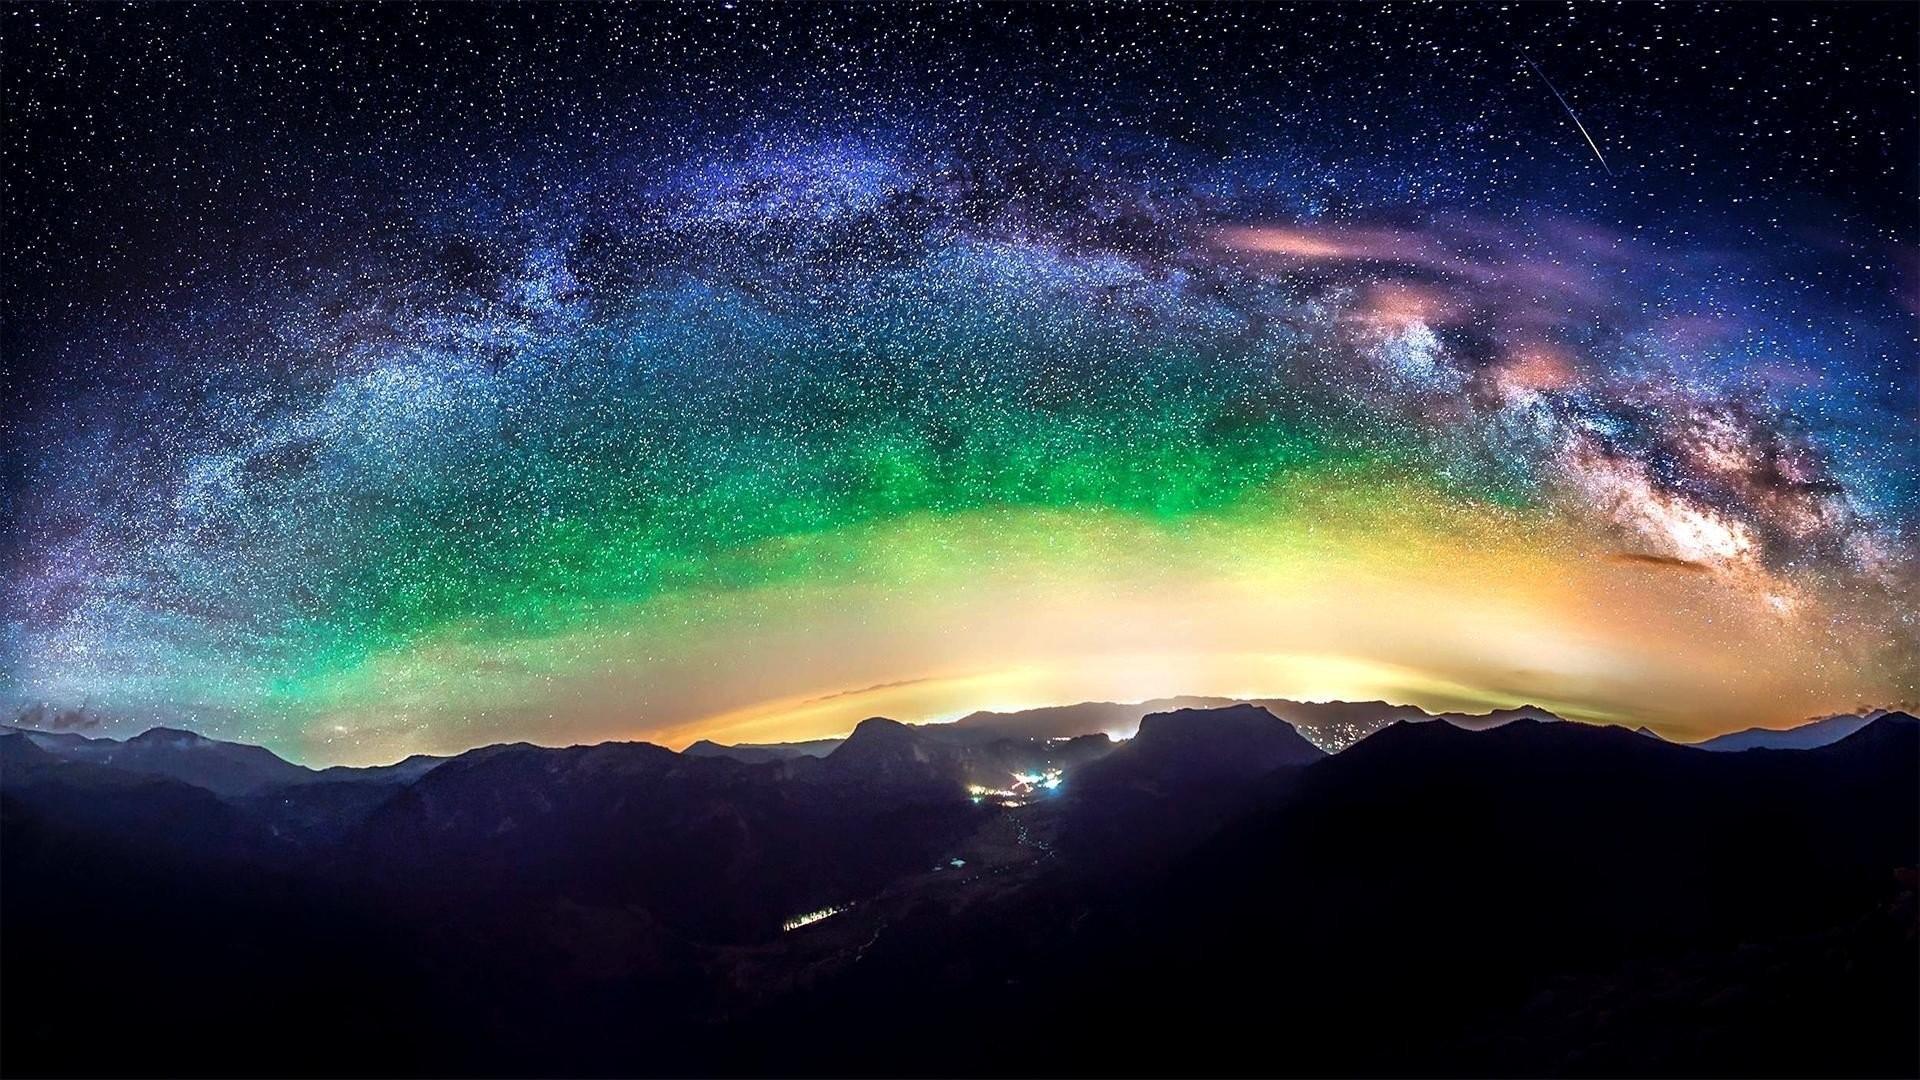 star mountain night light lights lights